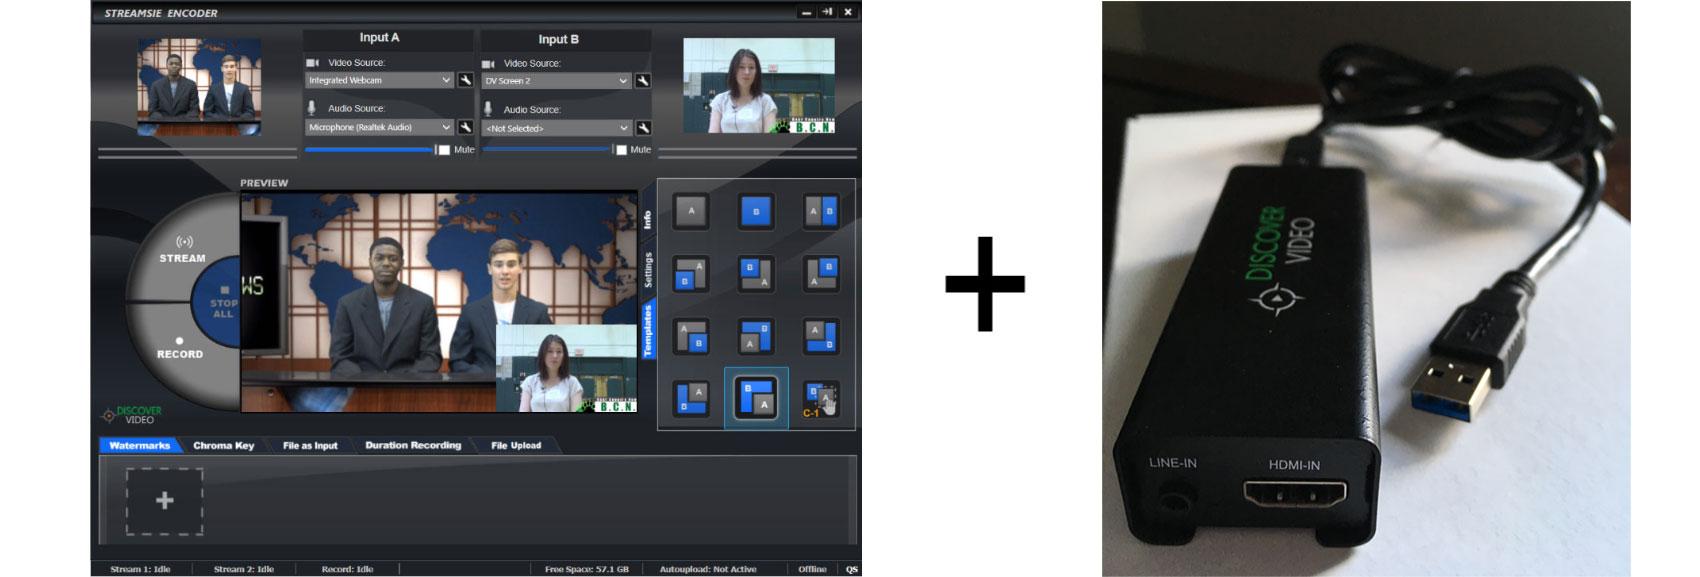 Streamsie Software Video Encoder & Razor USB Converter Video School News Kit